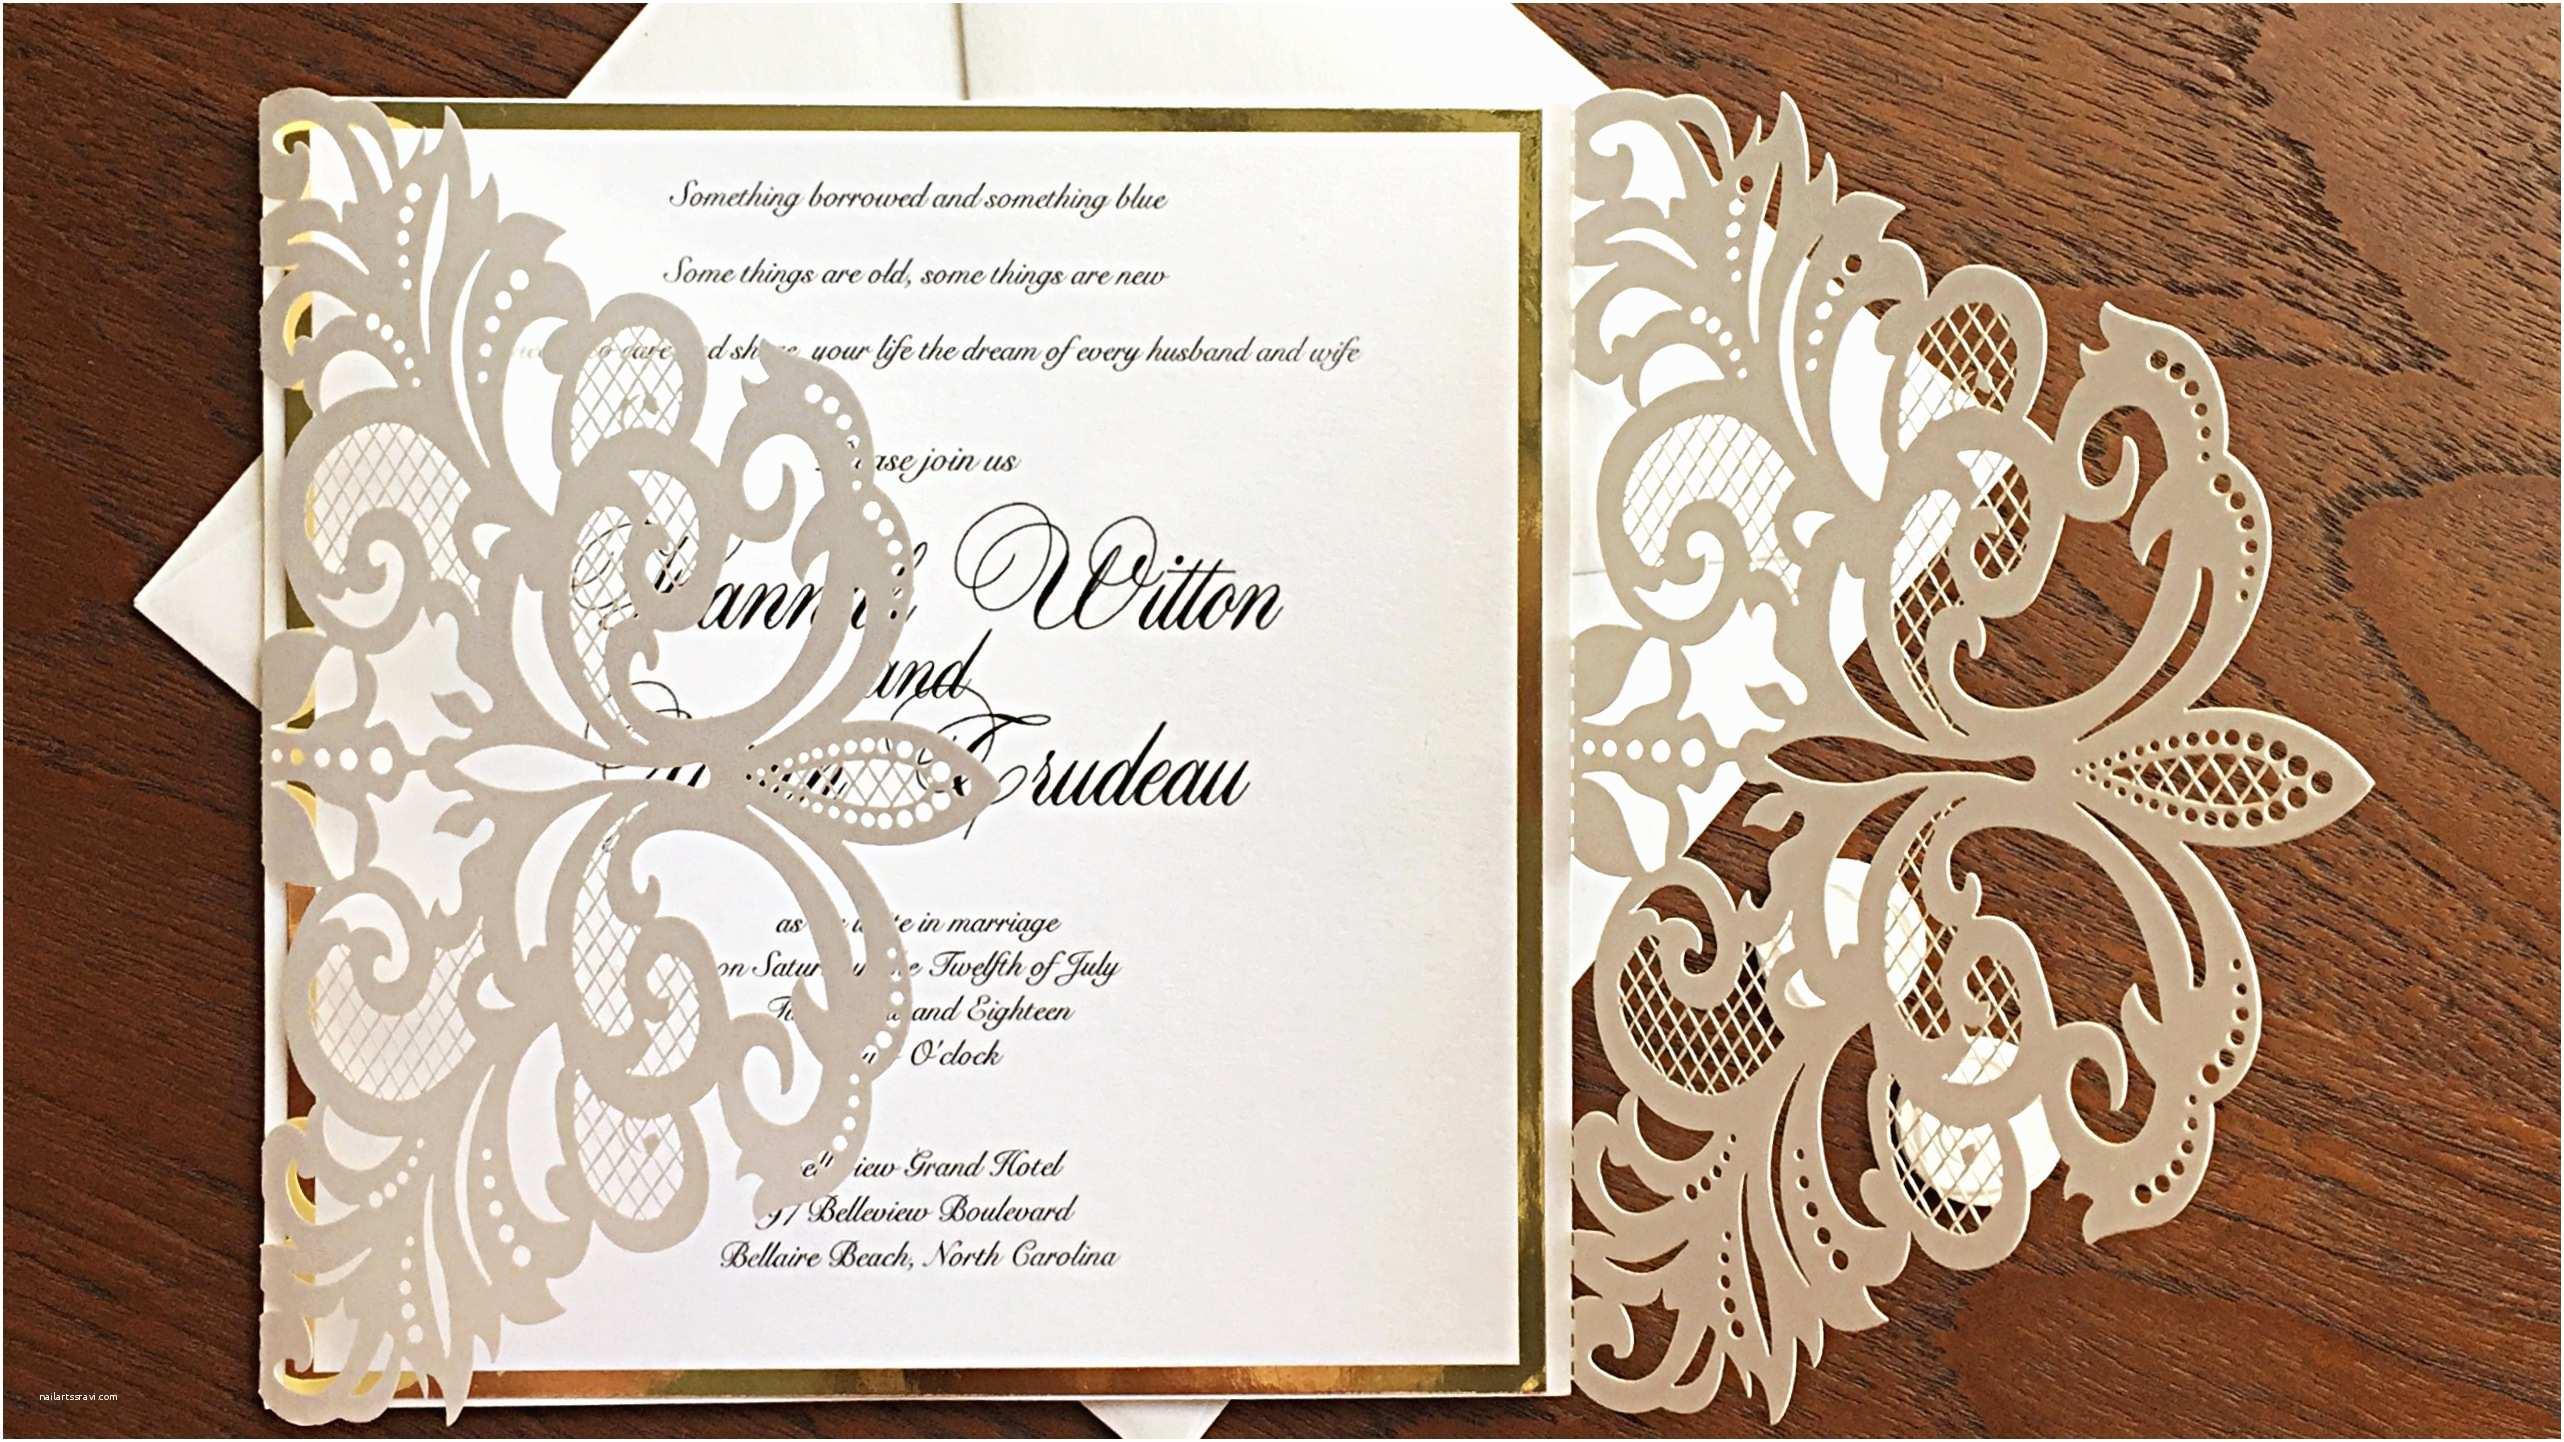 Laser Cut Wedding Invitations White Laser Cut Wedding Invitation – the Bow Invitations